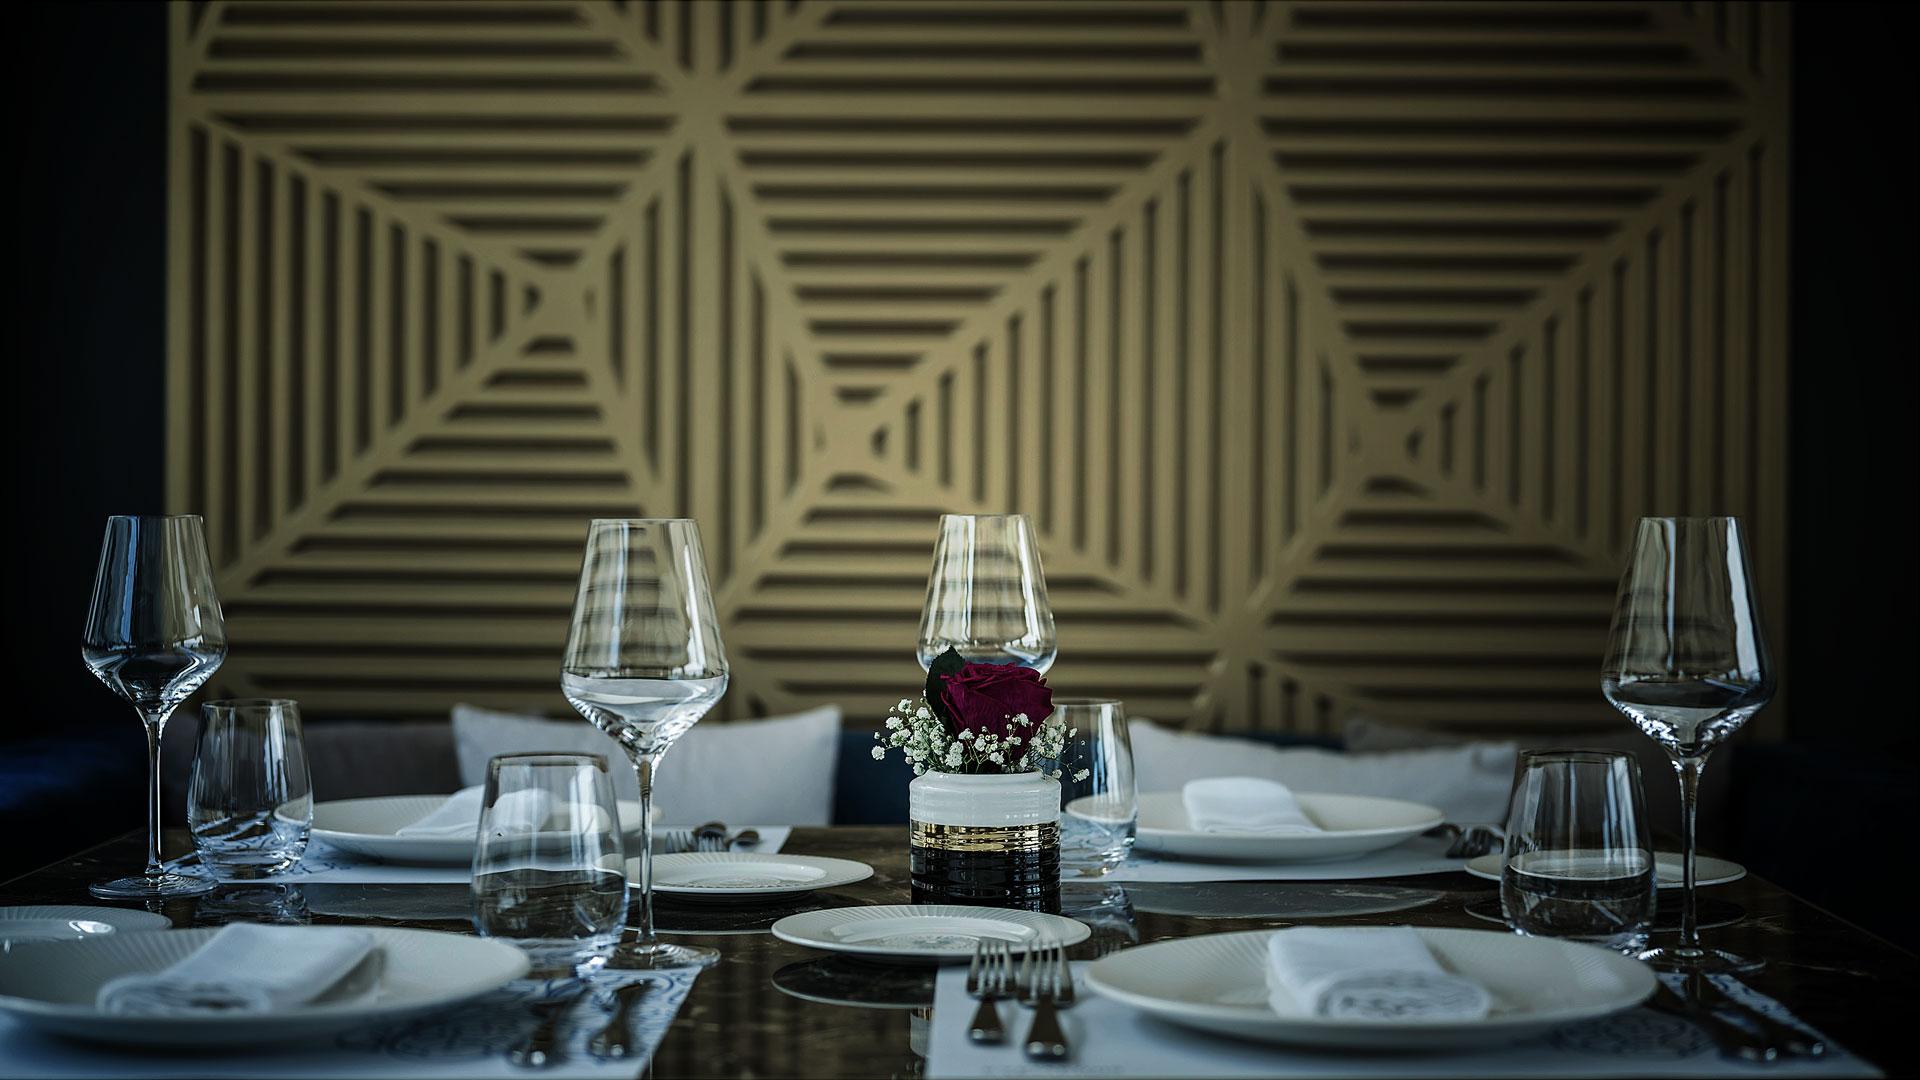 Dinner In Chania- Luxury dinner Chania- Sea view Restaurant Almyvita- Almyrida